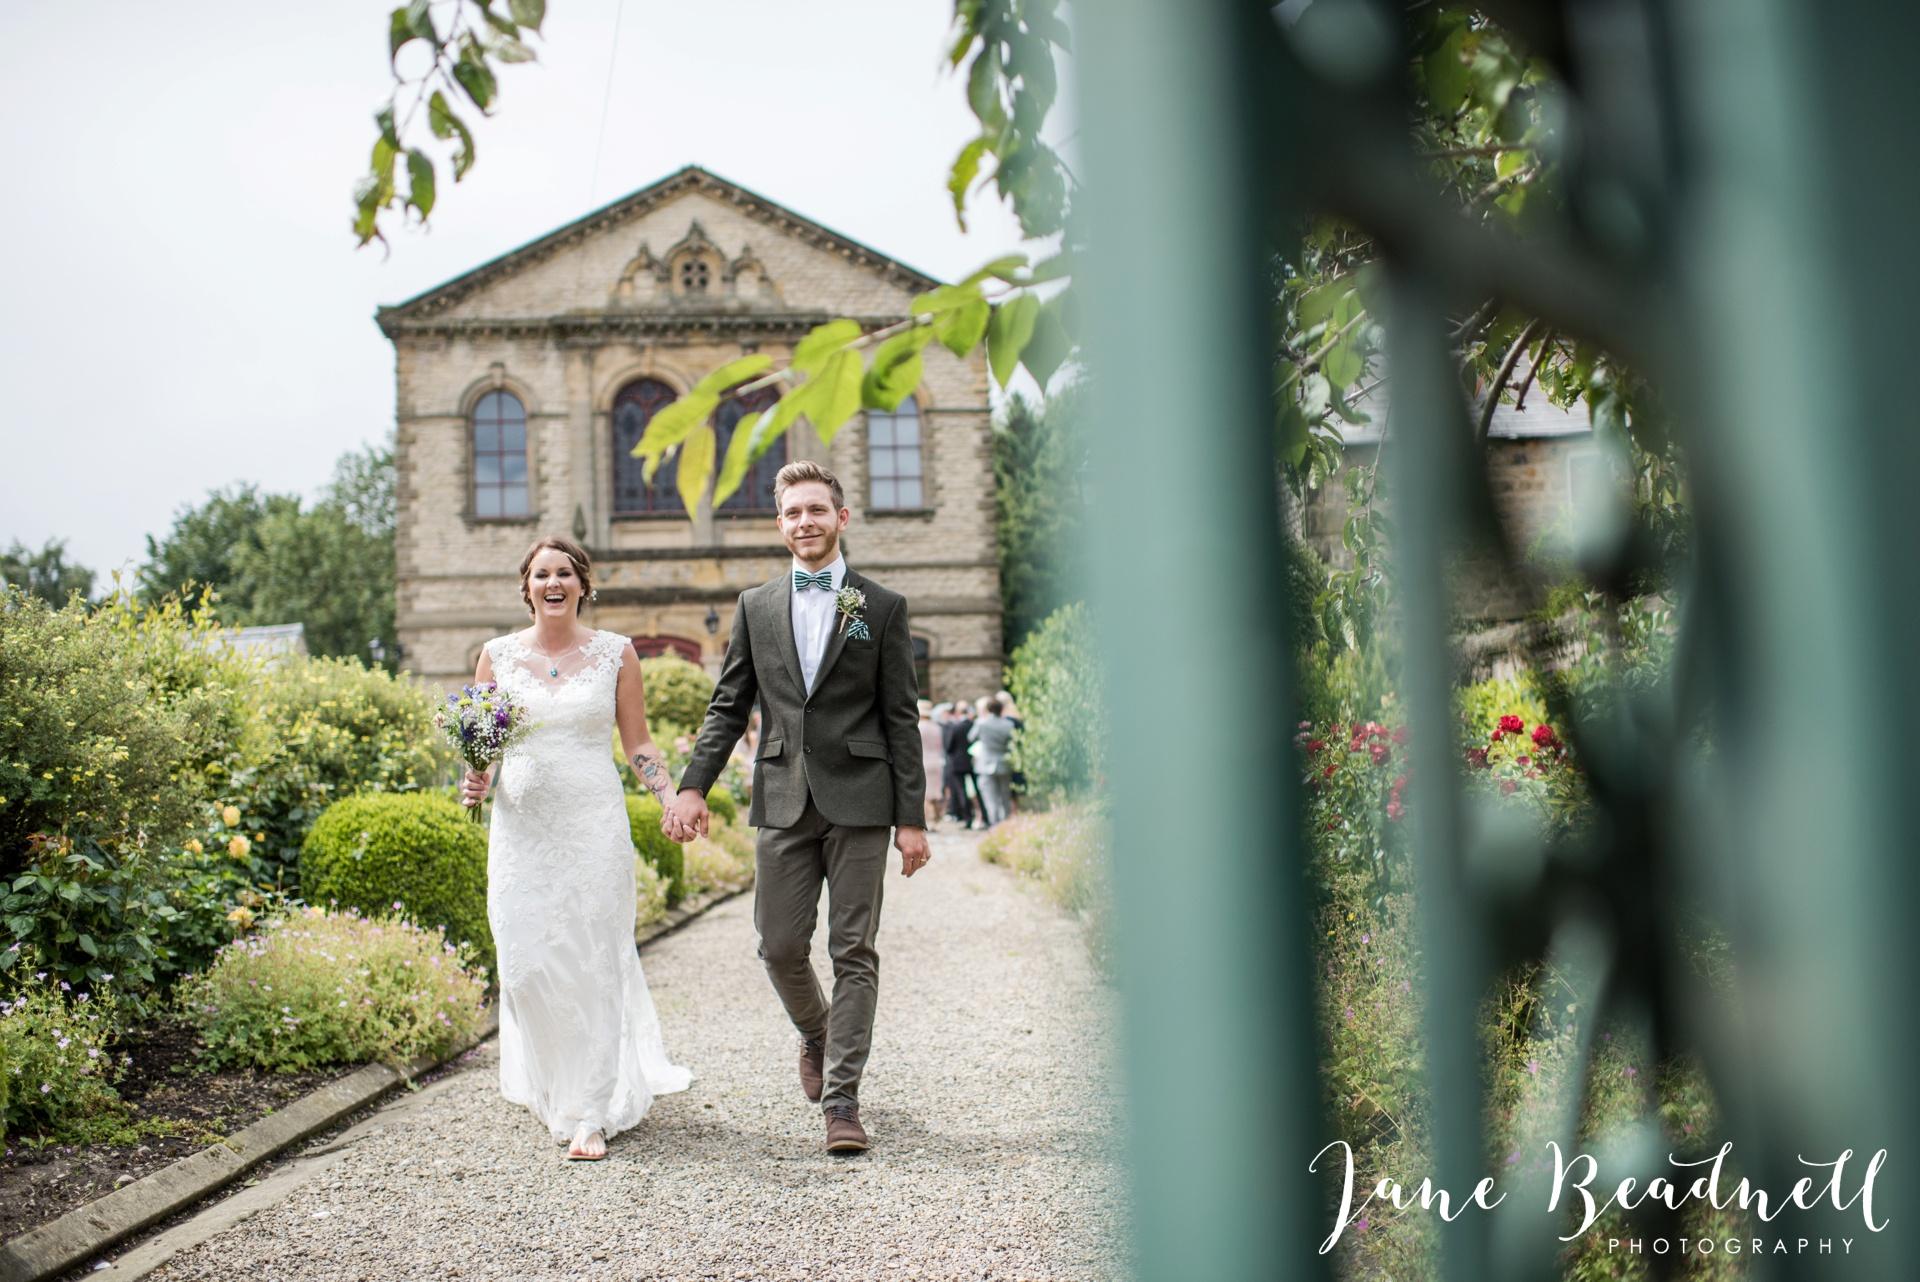 Jane Beadnell fine art wedding photographer The Old Deanery Ripon_0045